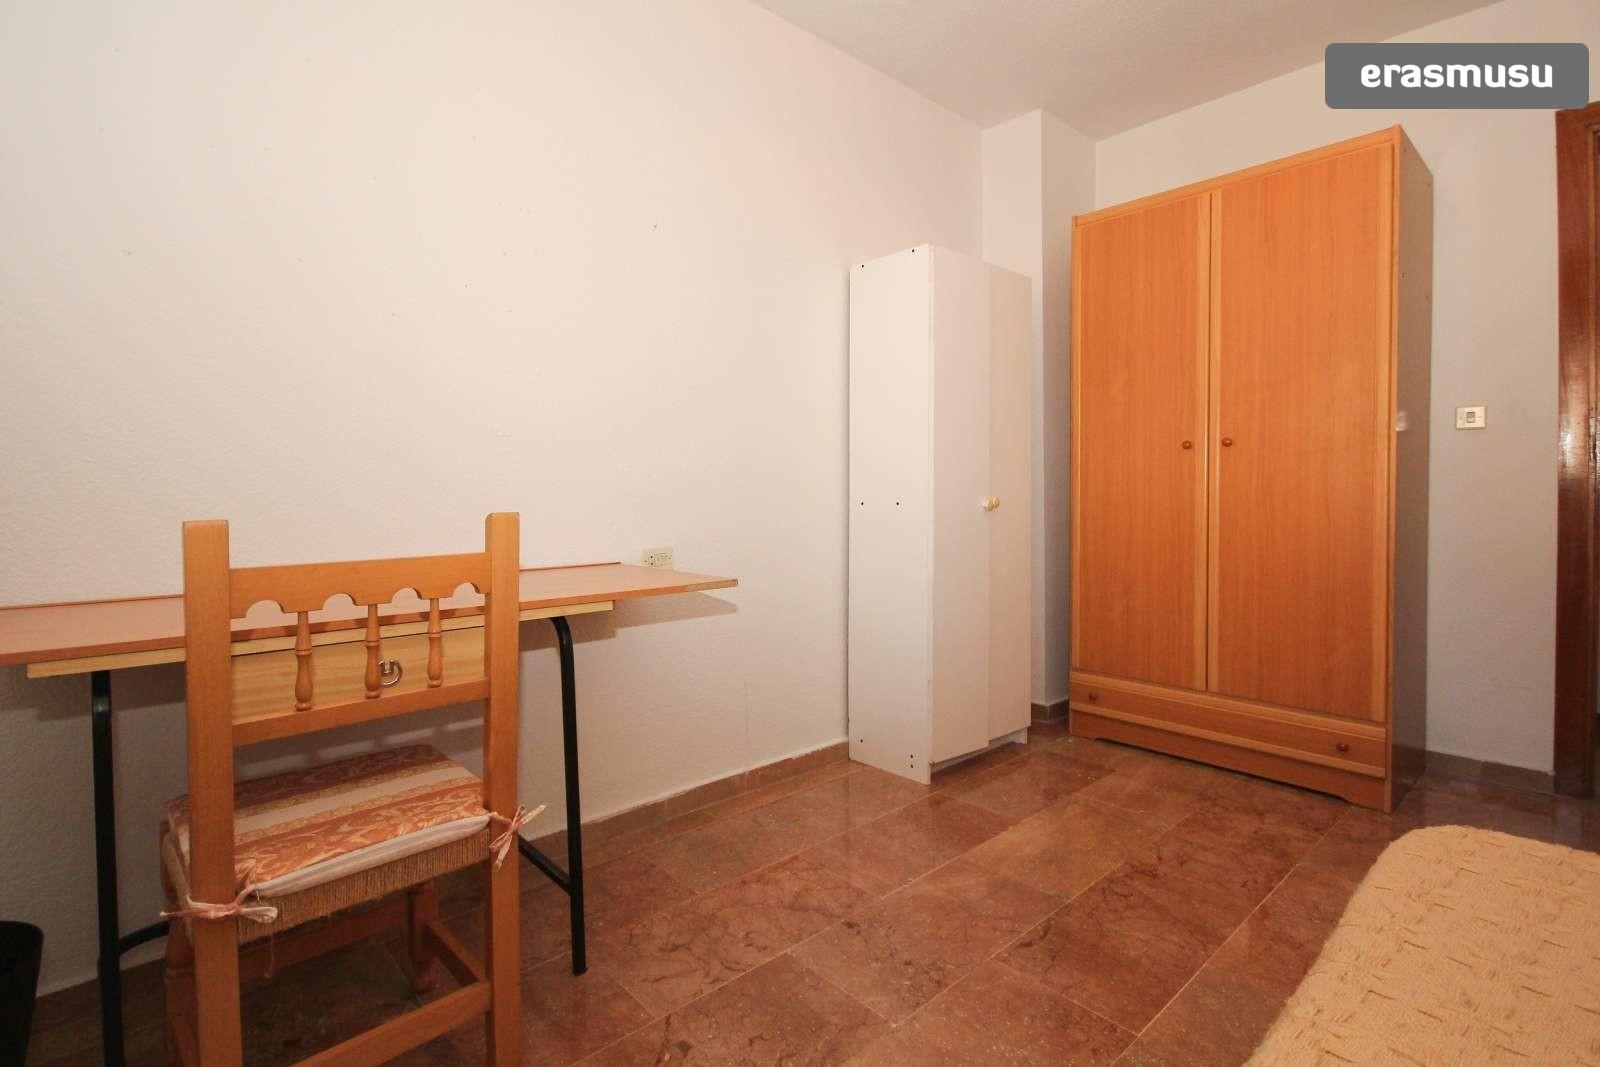 single-bed-cosy-rooms-rent-10-minutes-walk-granada-university-pe